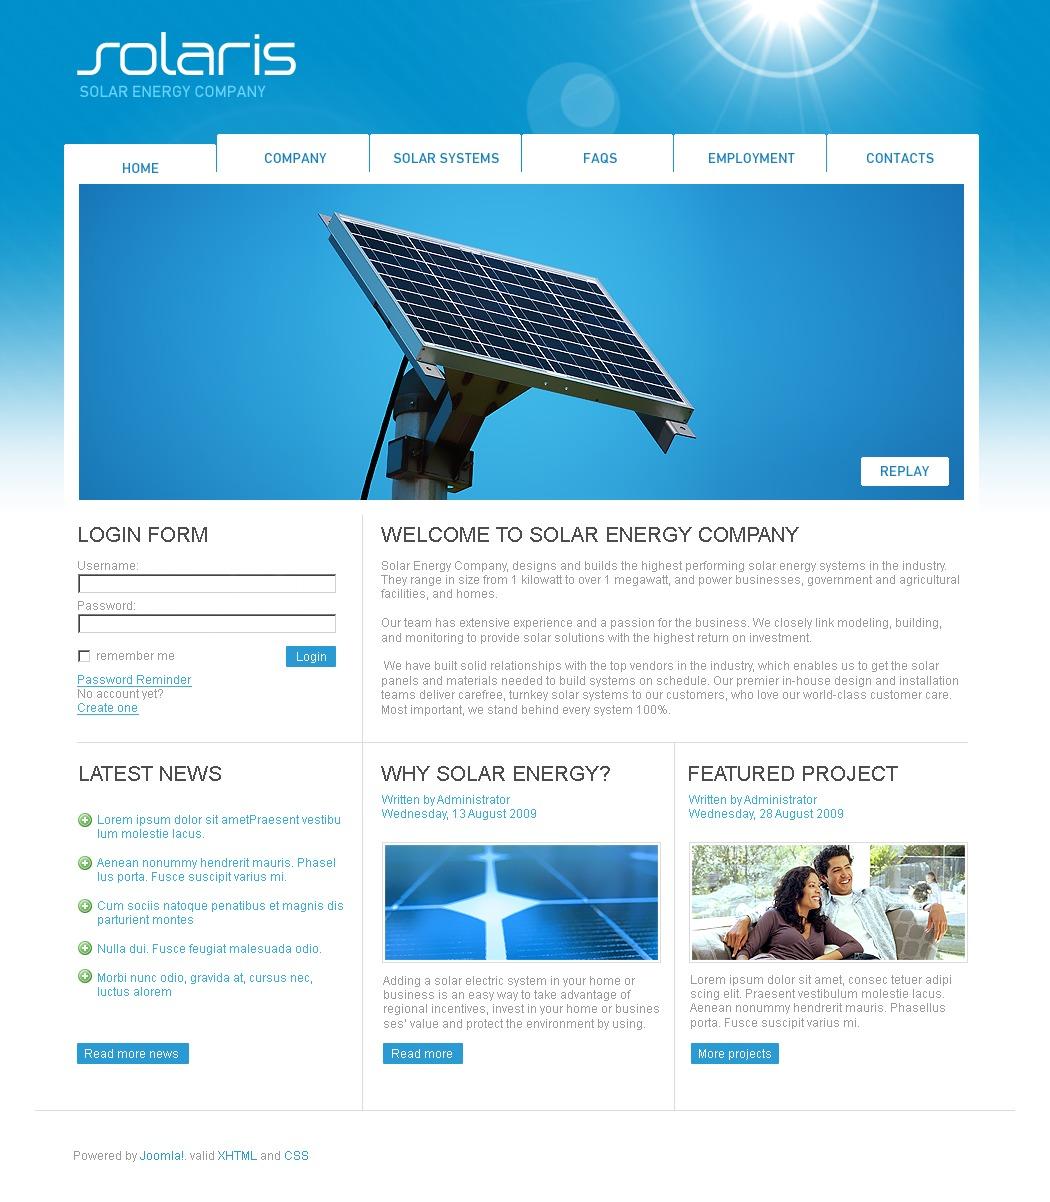 solar energy joomla template 26425. Black Bedroom Furniture Sets. Home Design Ideas